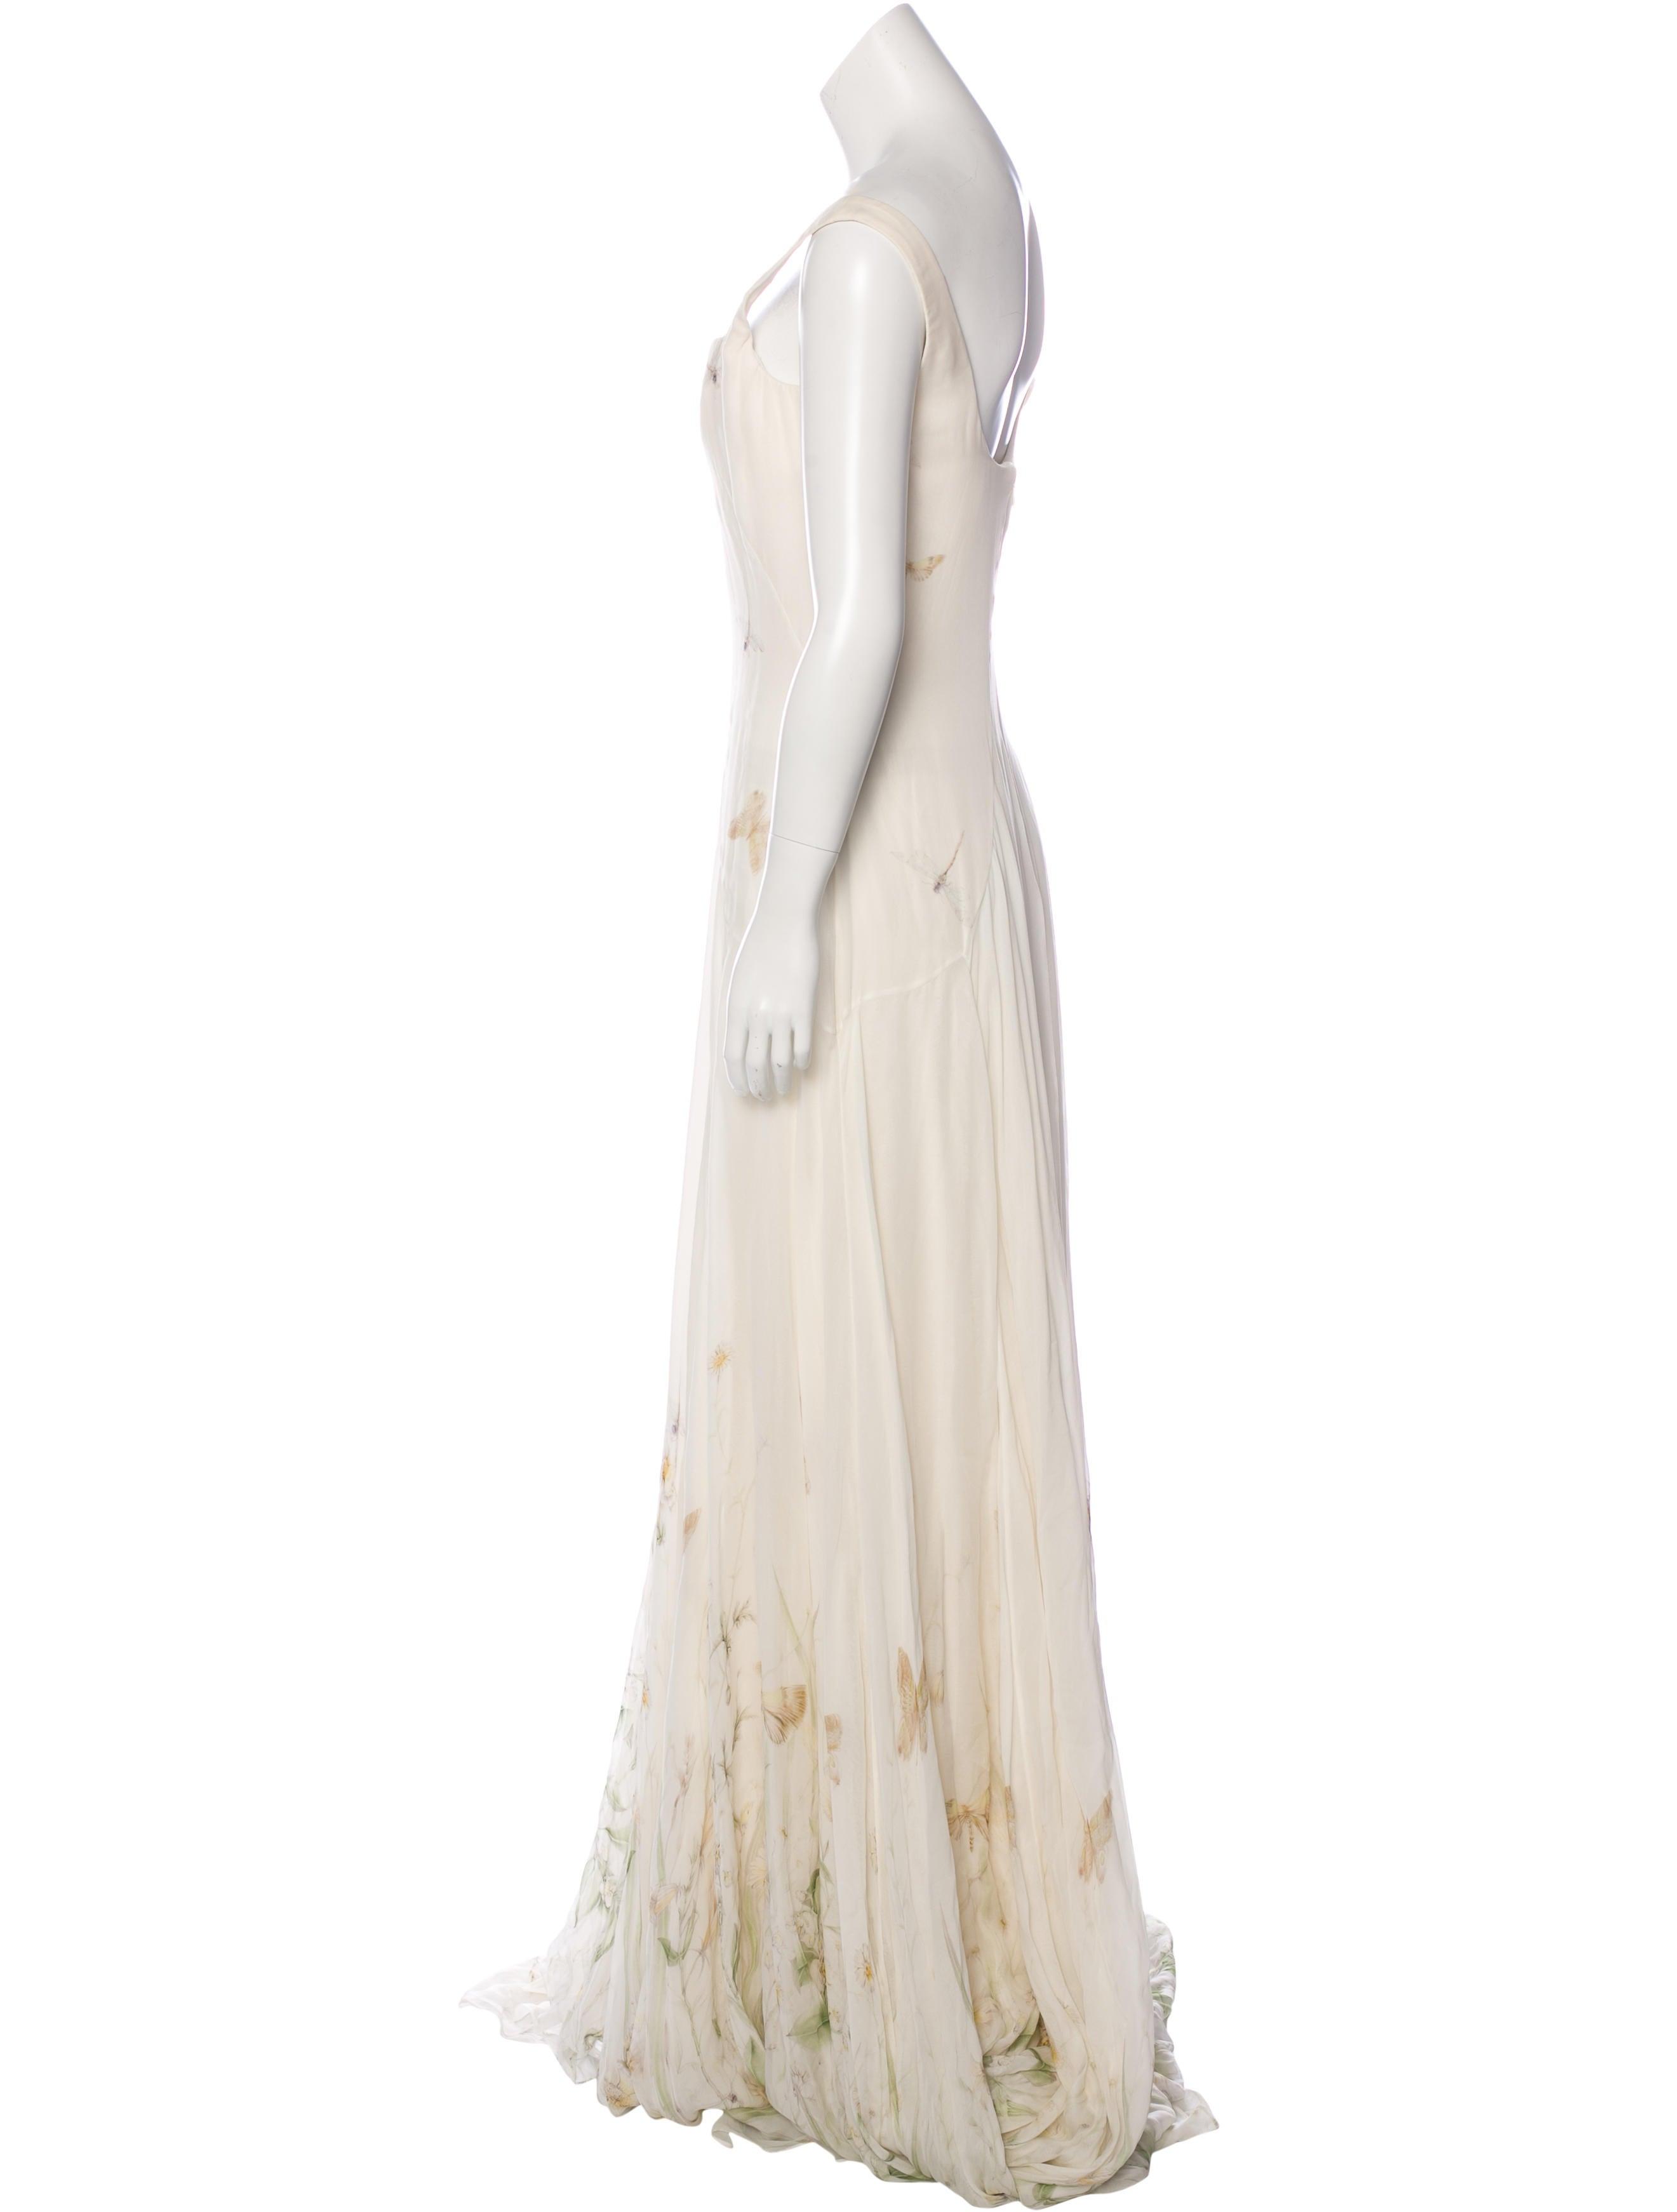 Alexander mcqueen silk meadow print gown dresses for Alexander mcqueen wedding dresses price